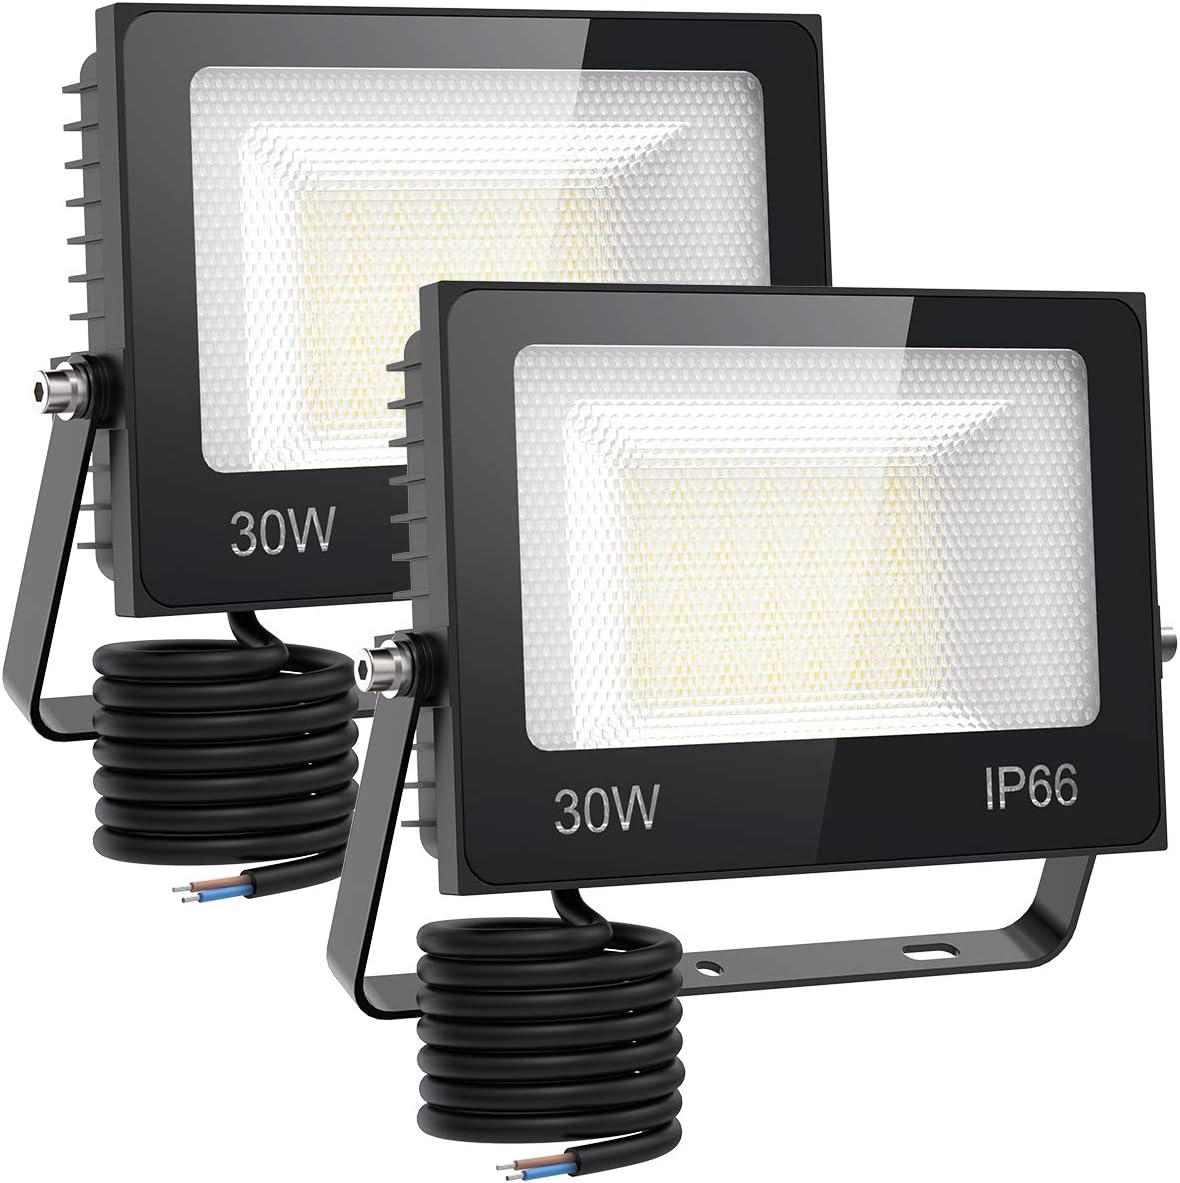 Jard/ín 9000L/úmenes Foco Proyector LED IP66 Impermeable 6500K Luz de Blanca para Terraza Patio Parque 100W Focos LED Exterior Garaje Almac/én